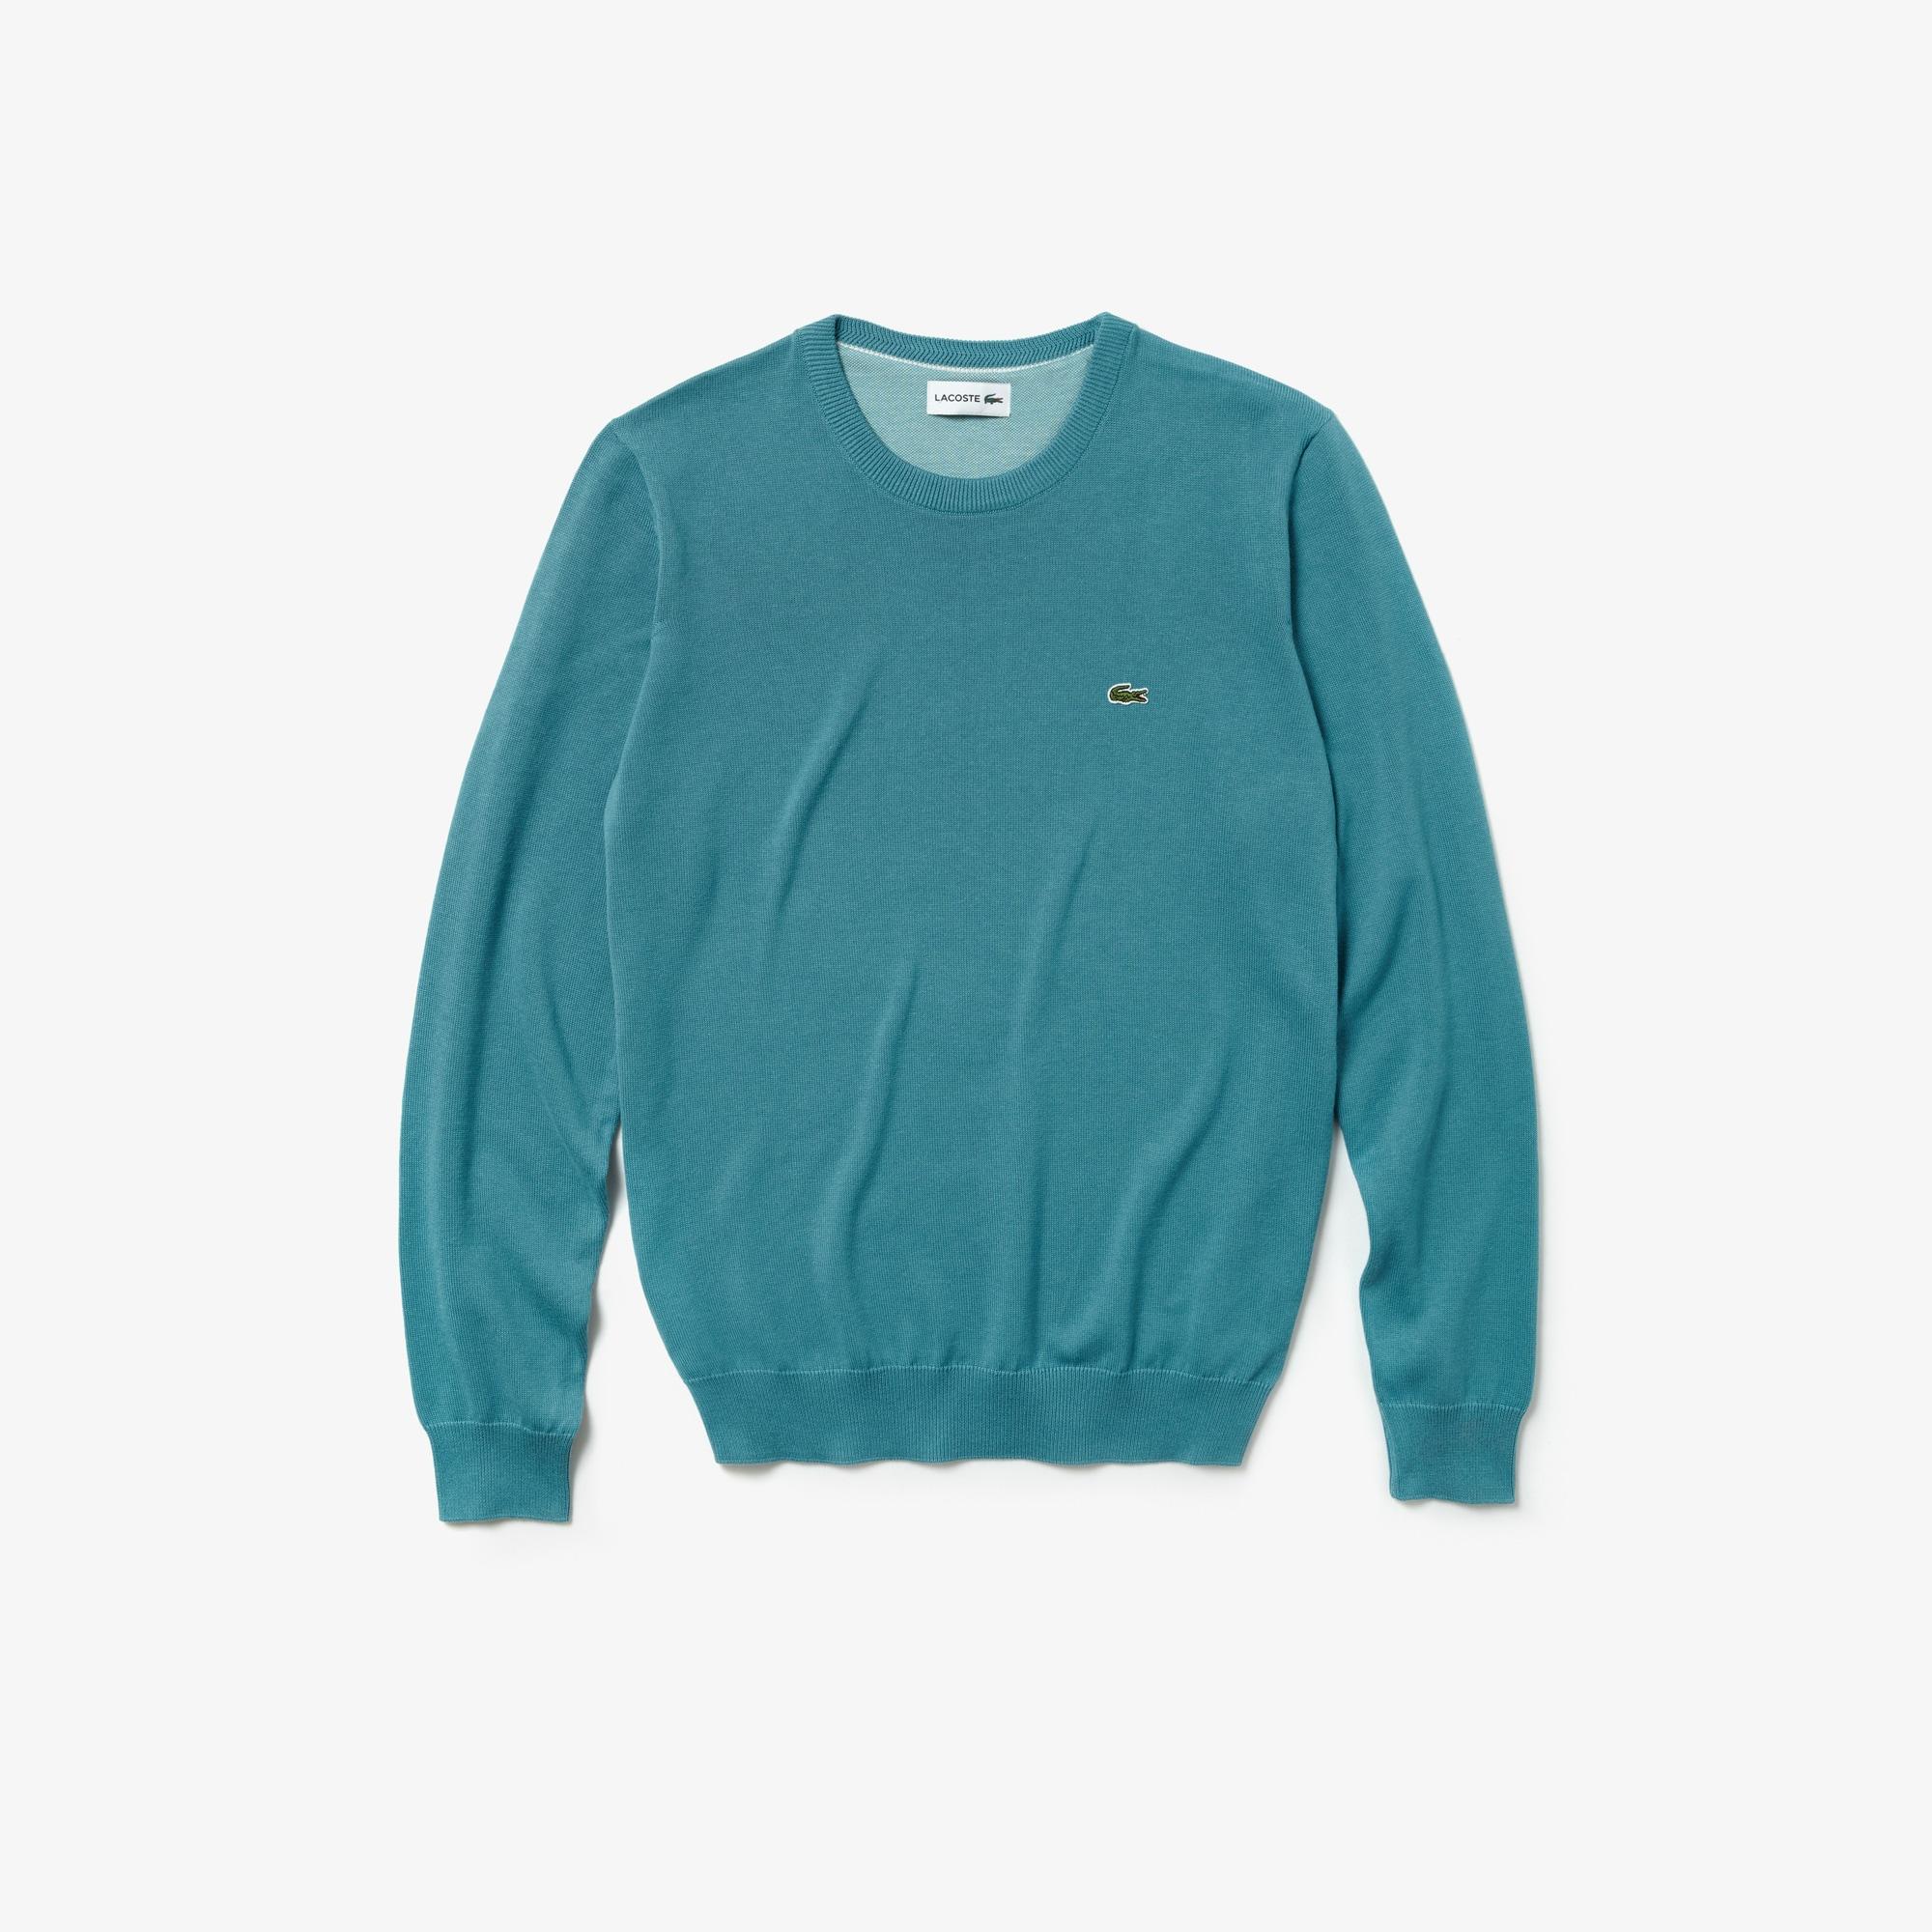 a0e2e5efc08 Men's Crew Neck Caviar Piqué Accent Cotton Jersey Sweater | LACOSTE